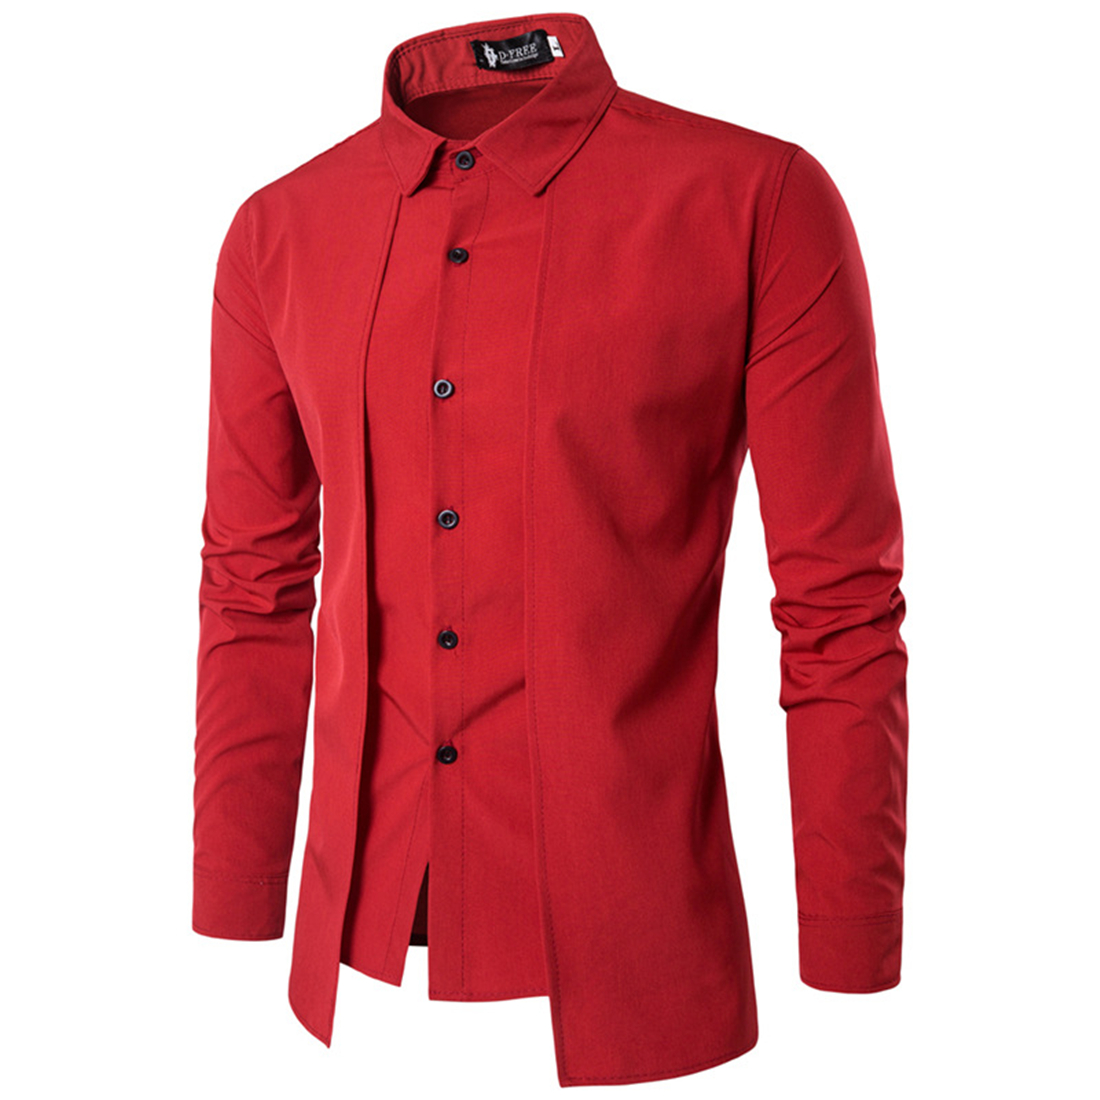 Red Black White Blue Shirt Men Long Sleeve Patchwork Tuxedo Shirts Summer Single-Breasted Irregular Dress Shirts 2017 Fake 2PCS